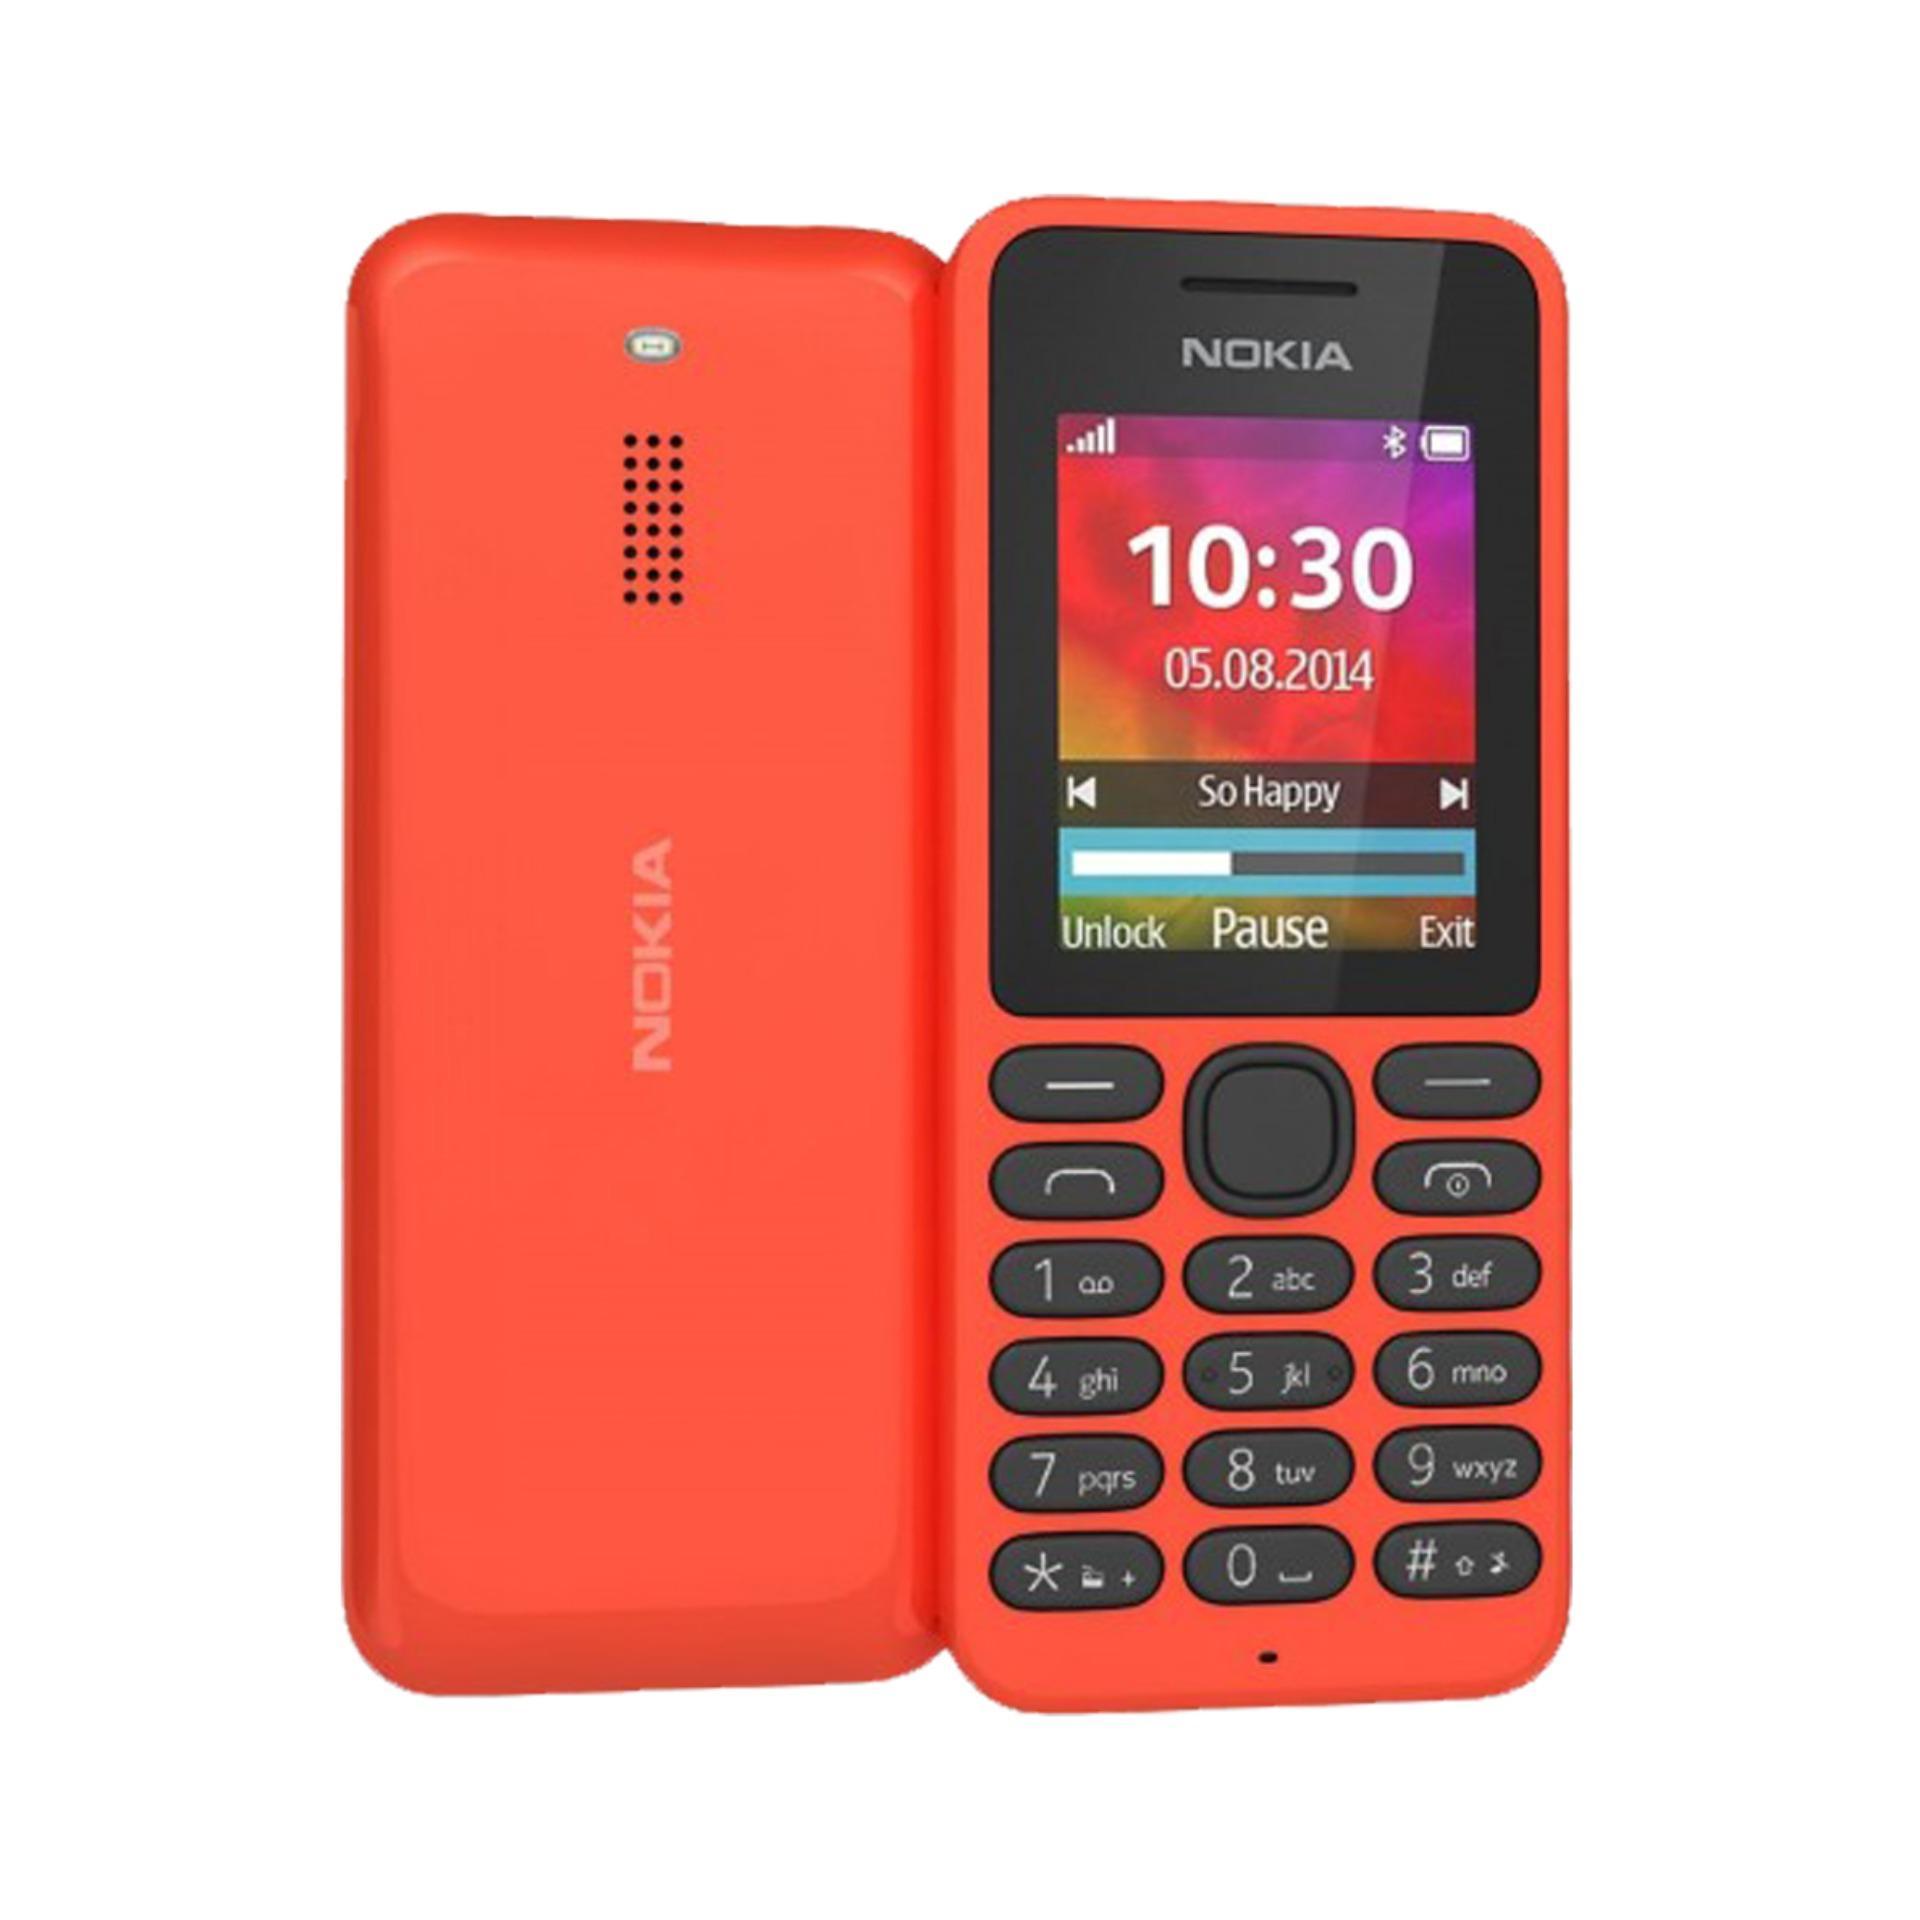 NOKIA 6300 - GARANSI 1 BULAN - BEST SELLER Nokia 130 Dual SIM Nokia 130 Dual SIM